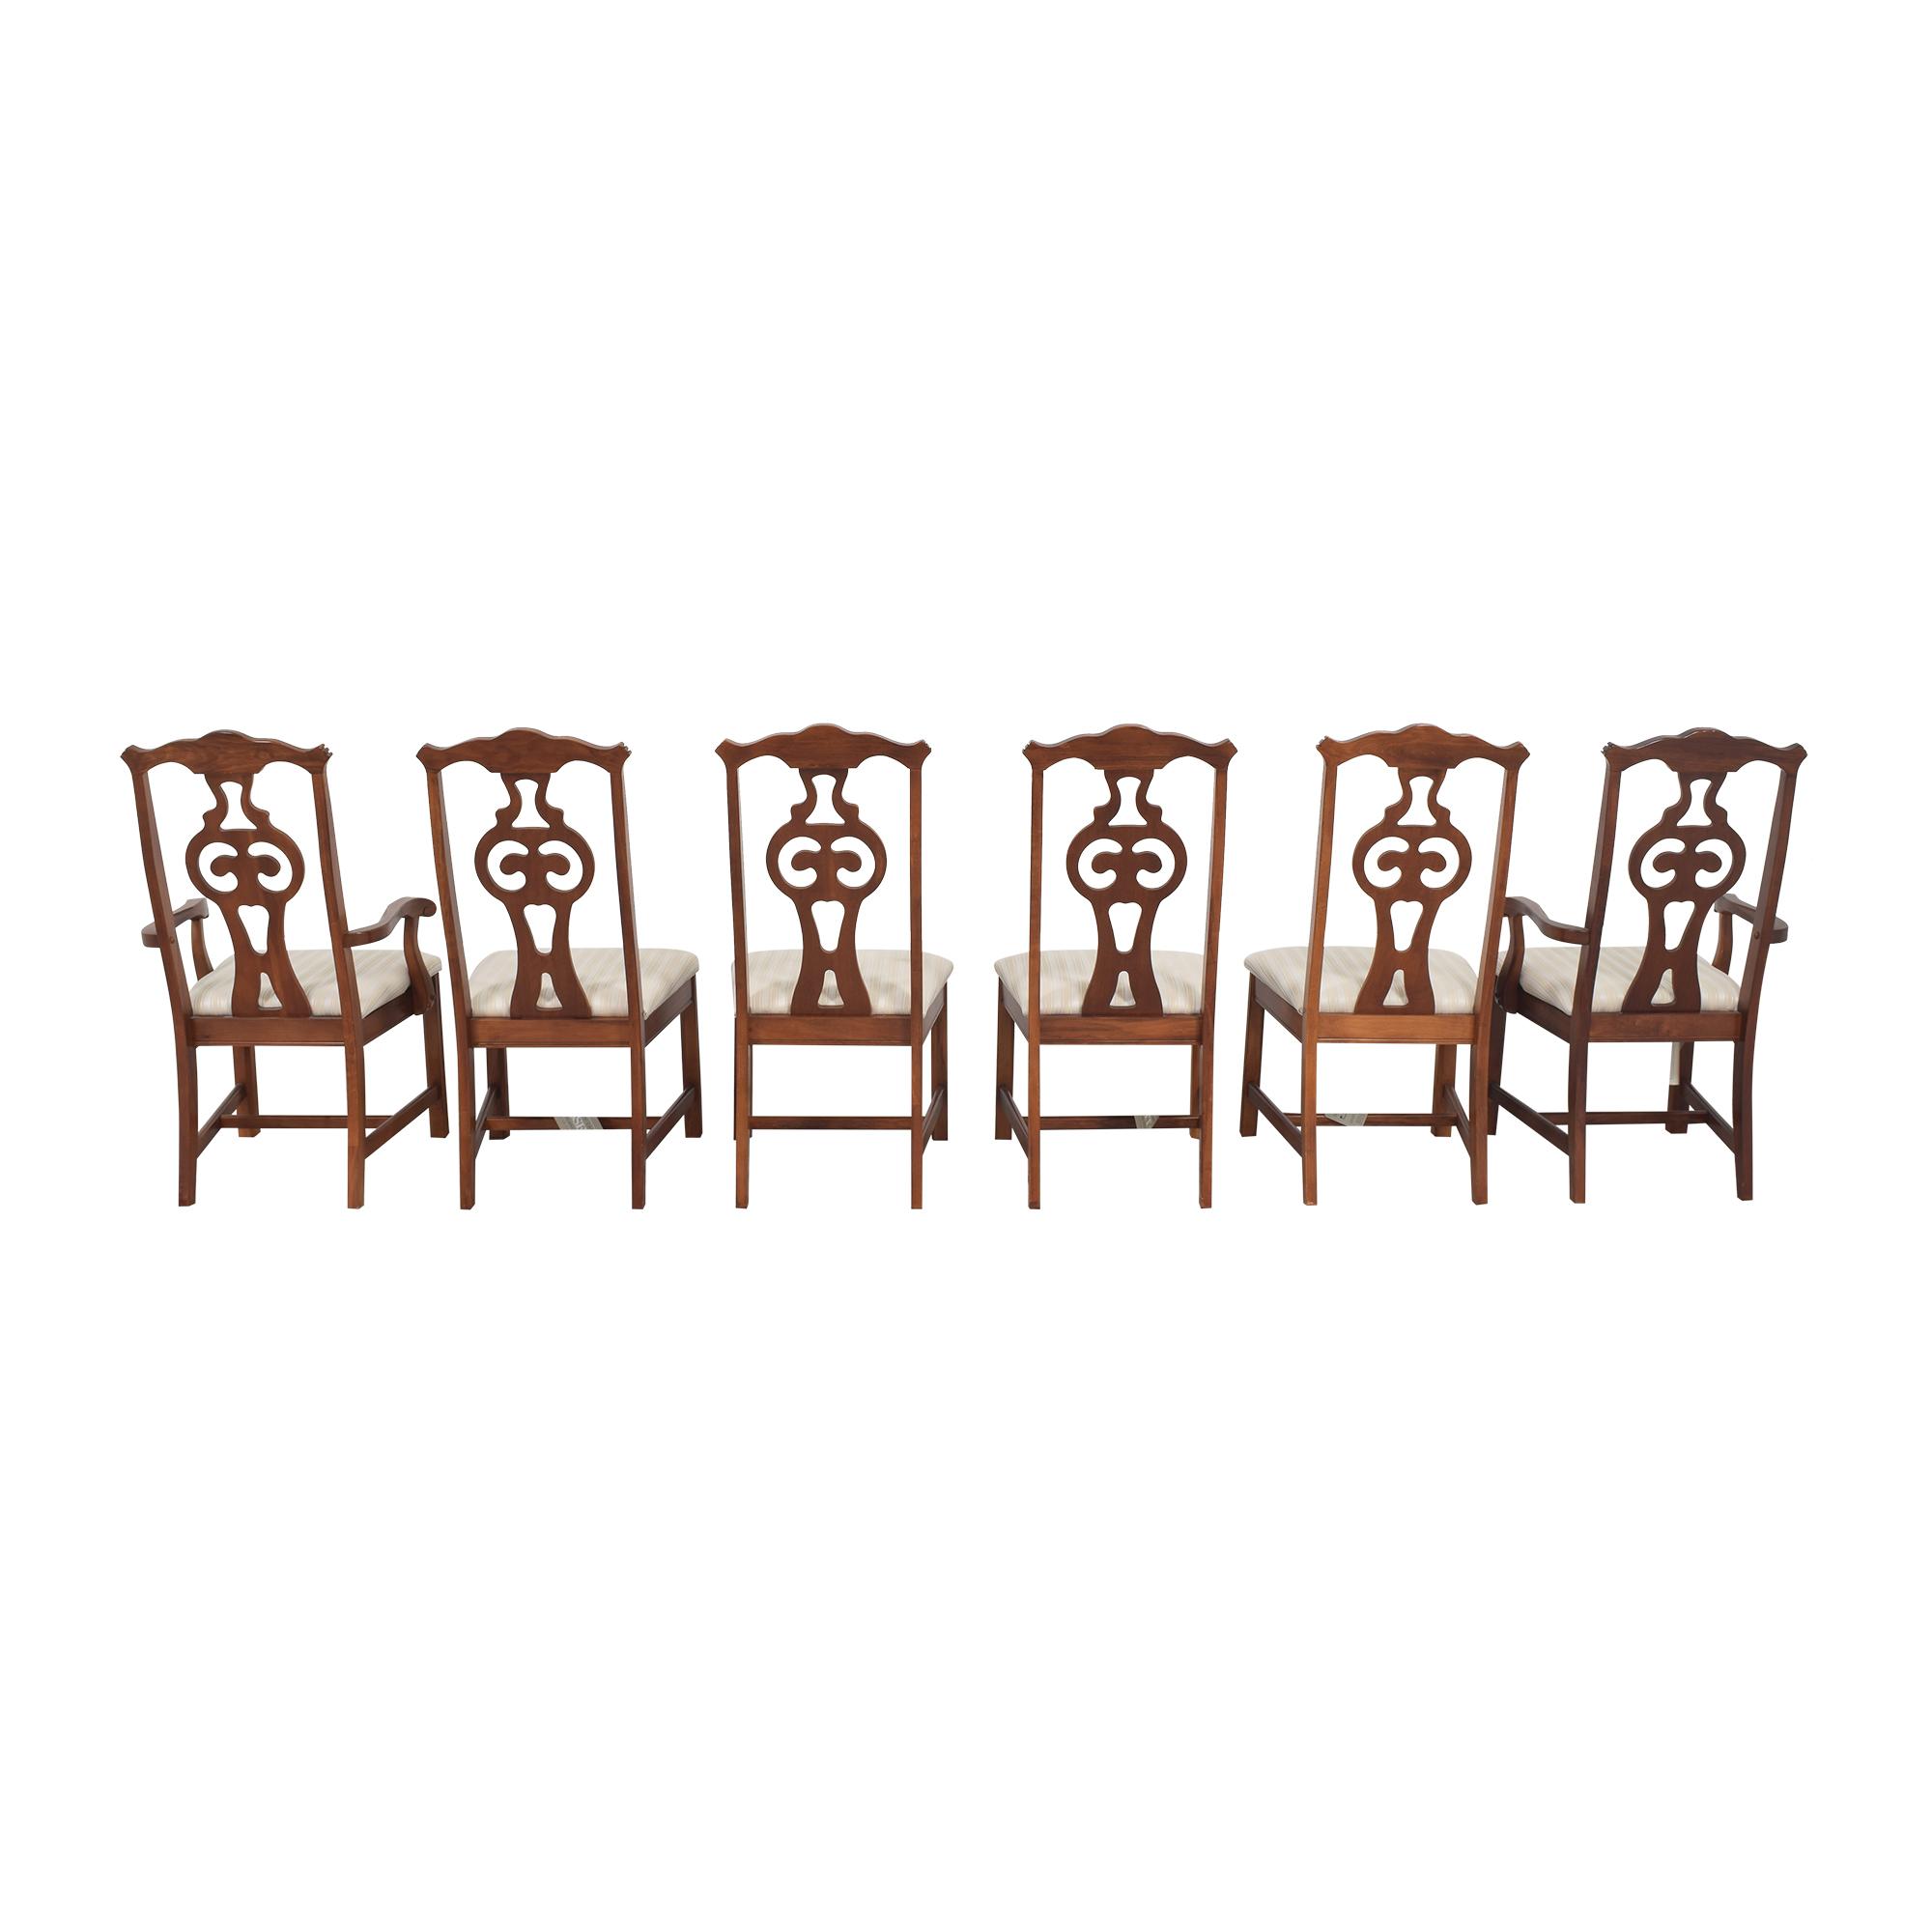 Bassett Furniture Bassett Furniture Upholstered Dining Chairs second hand